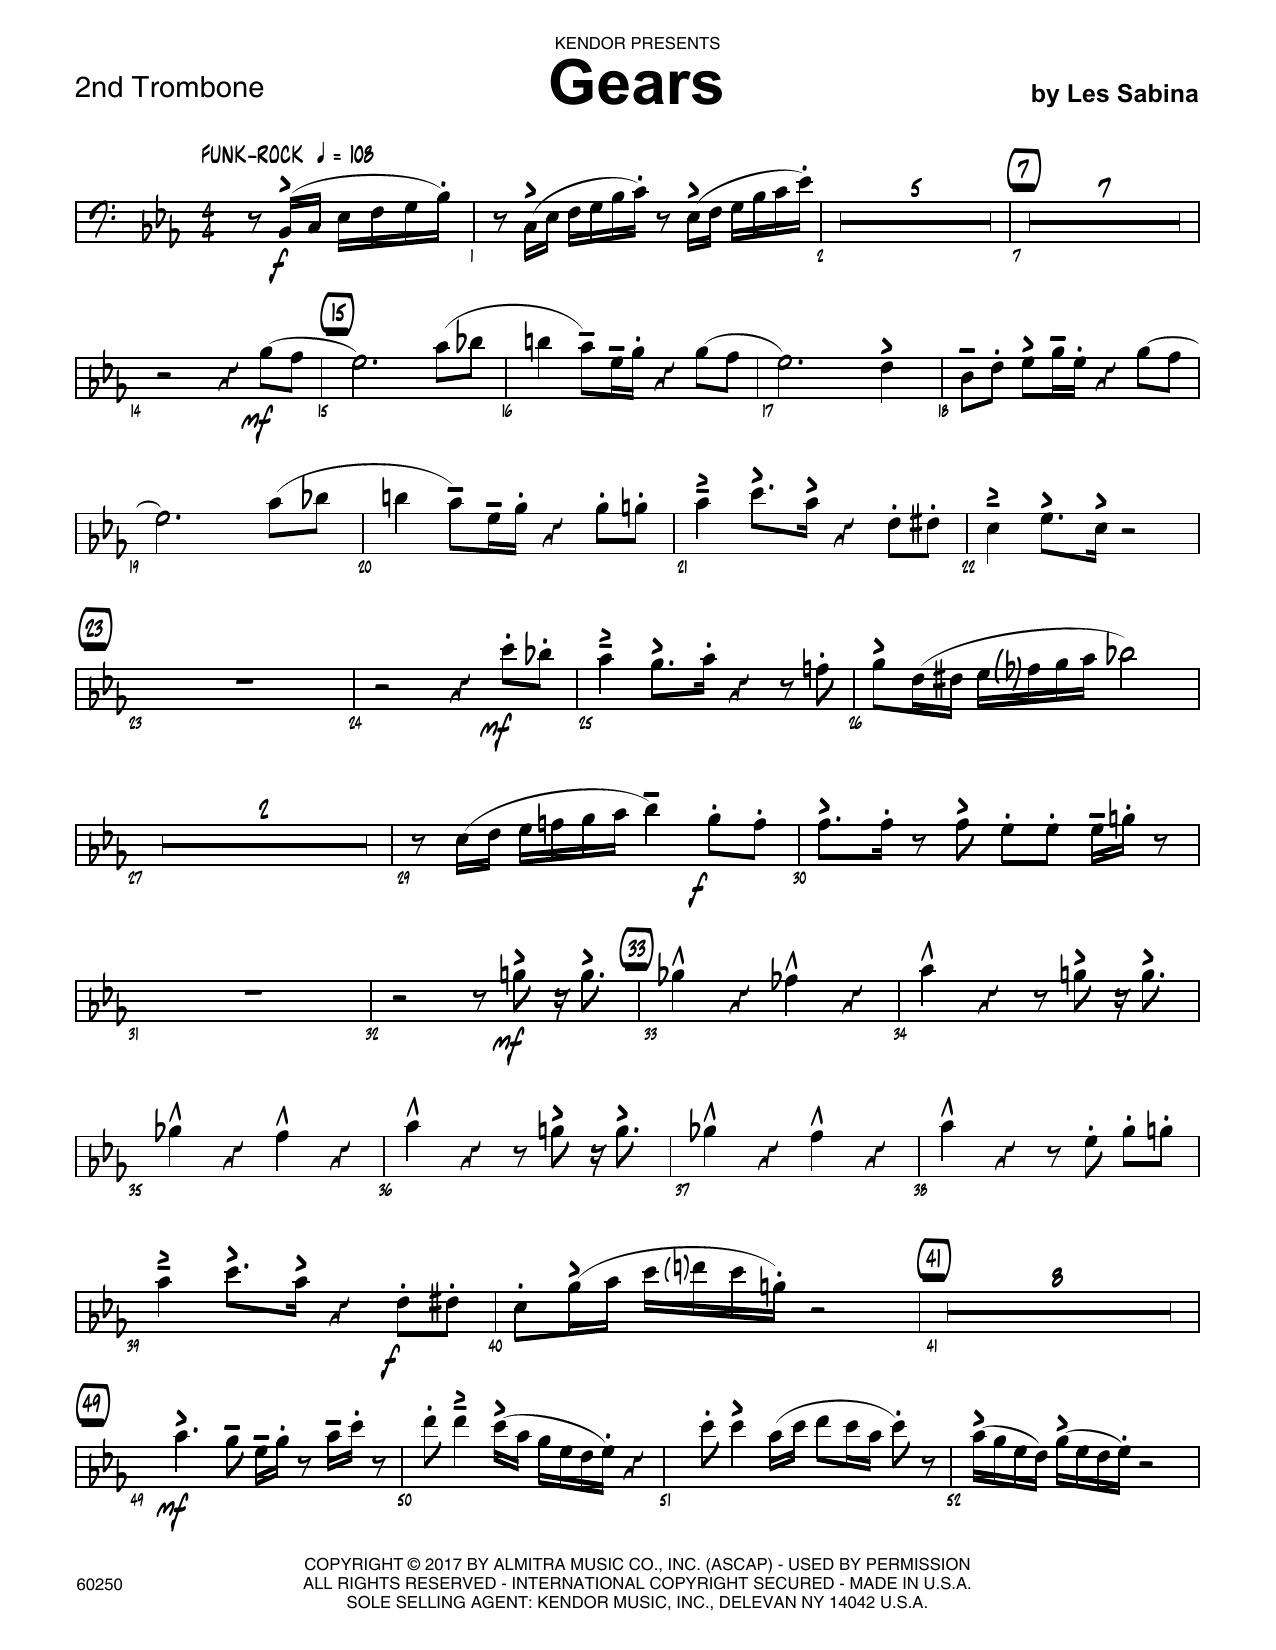 Les Sabina Gears - 2nd Trombone sheet music notes printable PDF score